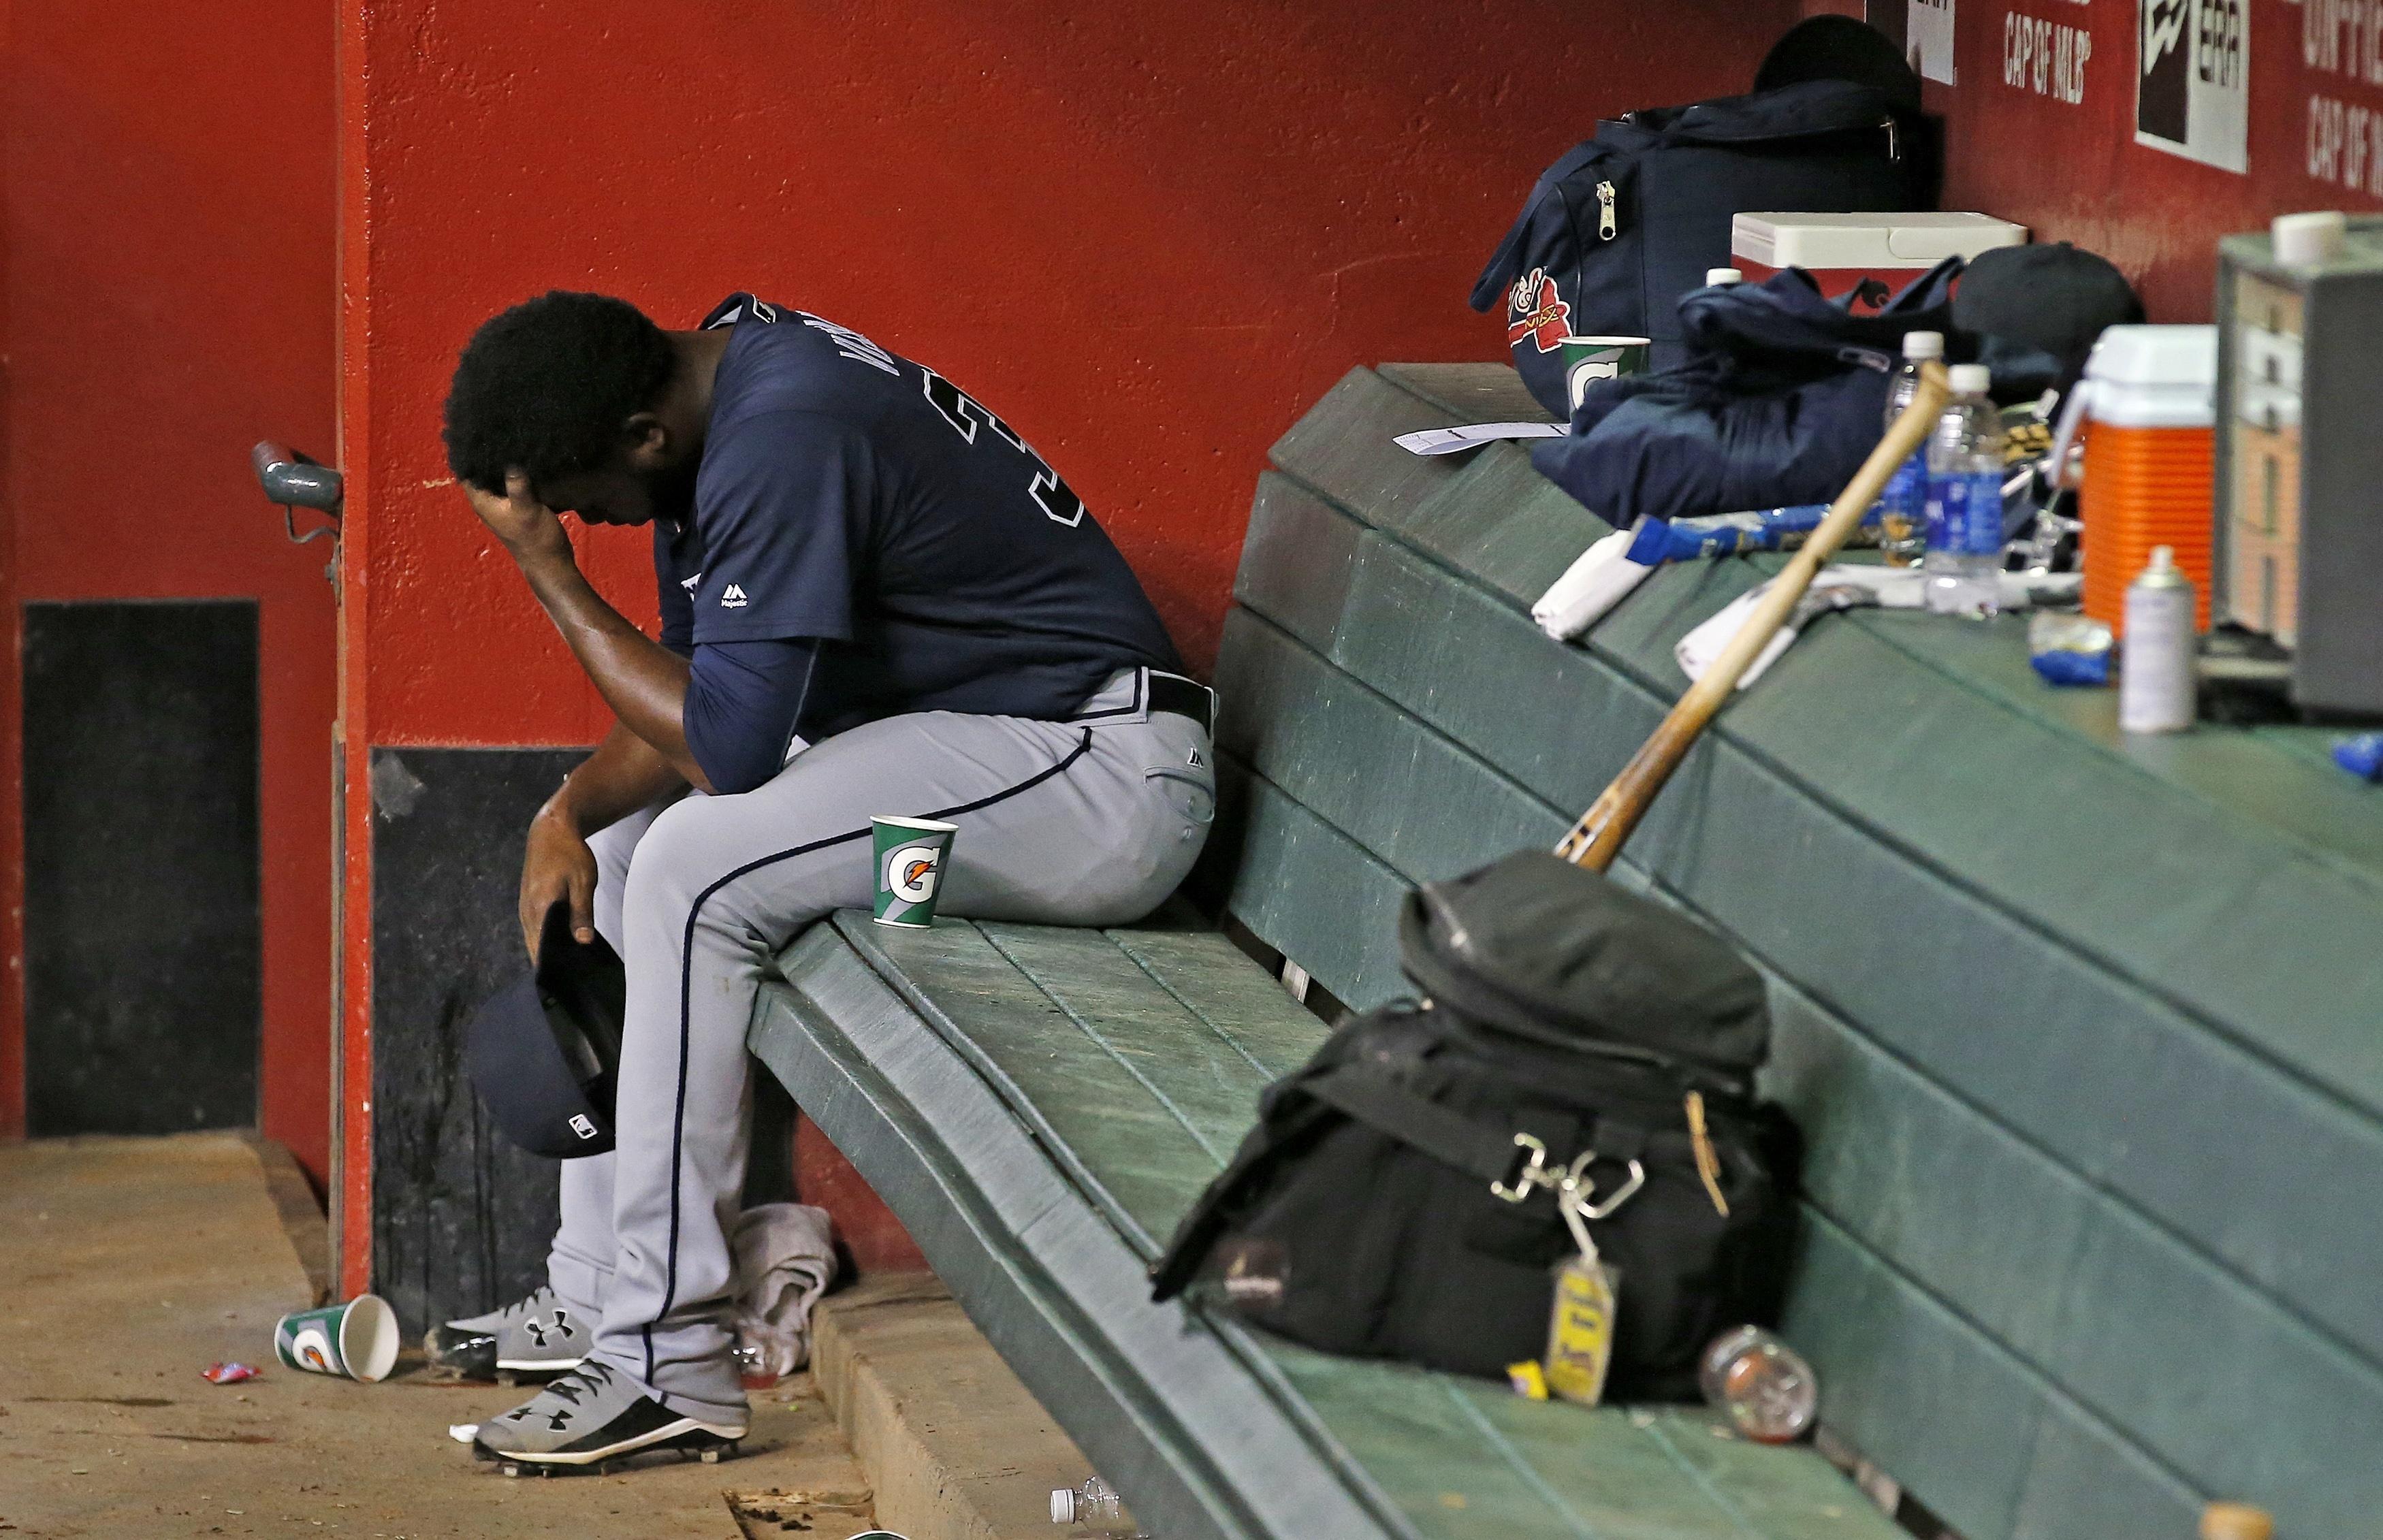 Braves_diamondbacks_baseball